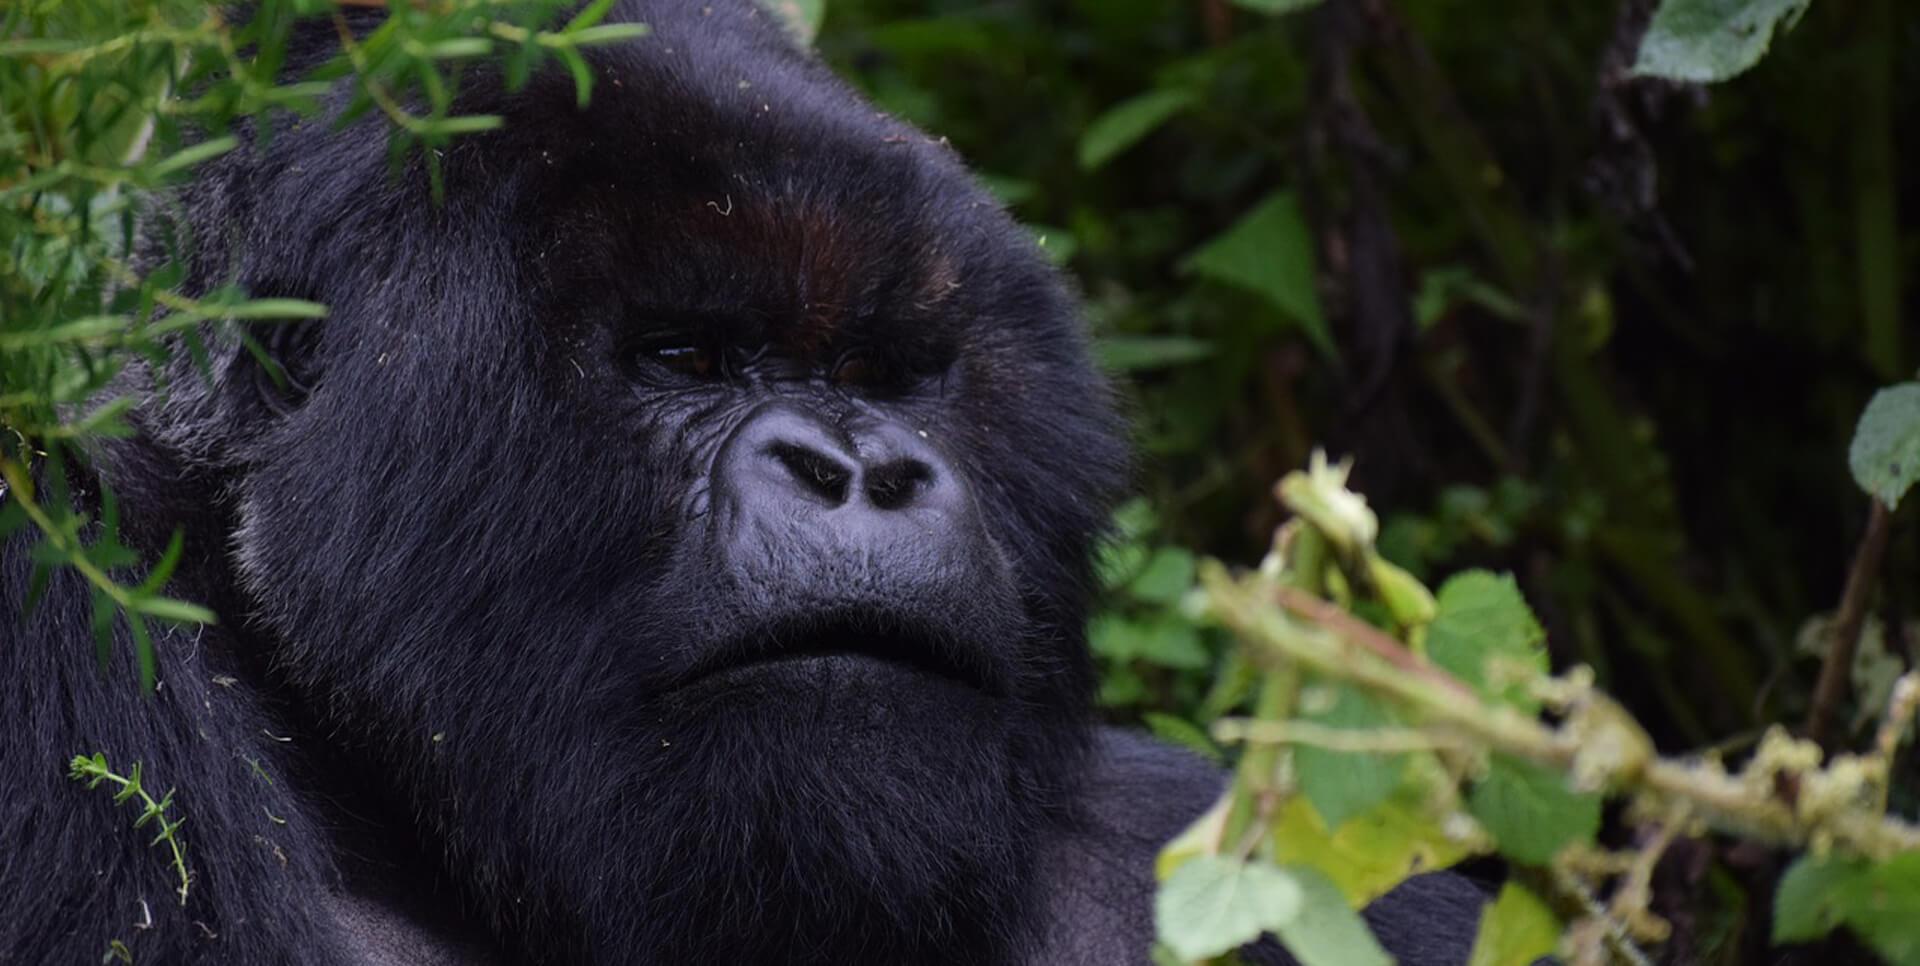 gorillas in rwanda, gorilla safaris rwanda, gorilla tours rwanda, rwanda gorillas, rwanda gorilla trekking, gorilla trekking rwanda, gorilla trekking rwanda, gorillas in rwanda, rwanda gorillas, wildlife safaris rwanda, uganda tours and safaris, uganda tour packages, rwanda chimpanzee tracking, chimp trekking in rwanda and uganda, visit rwanda, tour rwanda, travel rwanda, holidays in Rwanda, vacation in rwanda, safaris in rwanda, rwanda tours and travel, trip to rwanda, safari to rwanda, wildlife safaris in Rwanda, amazing rwanda, beautiful rwanda, rwanda gorilla trip, gorilla habituation experience, gorilla trekking tours, mountain gorillas, trekking safaris in rwanda, uganda trekking tours, gorilla adventure tours, gorilla trek africa, jungle african adventure